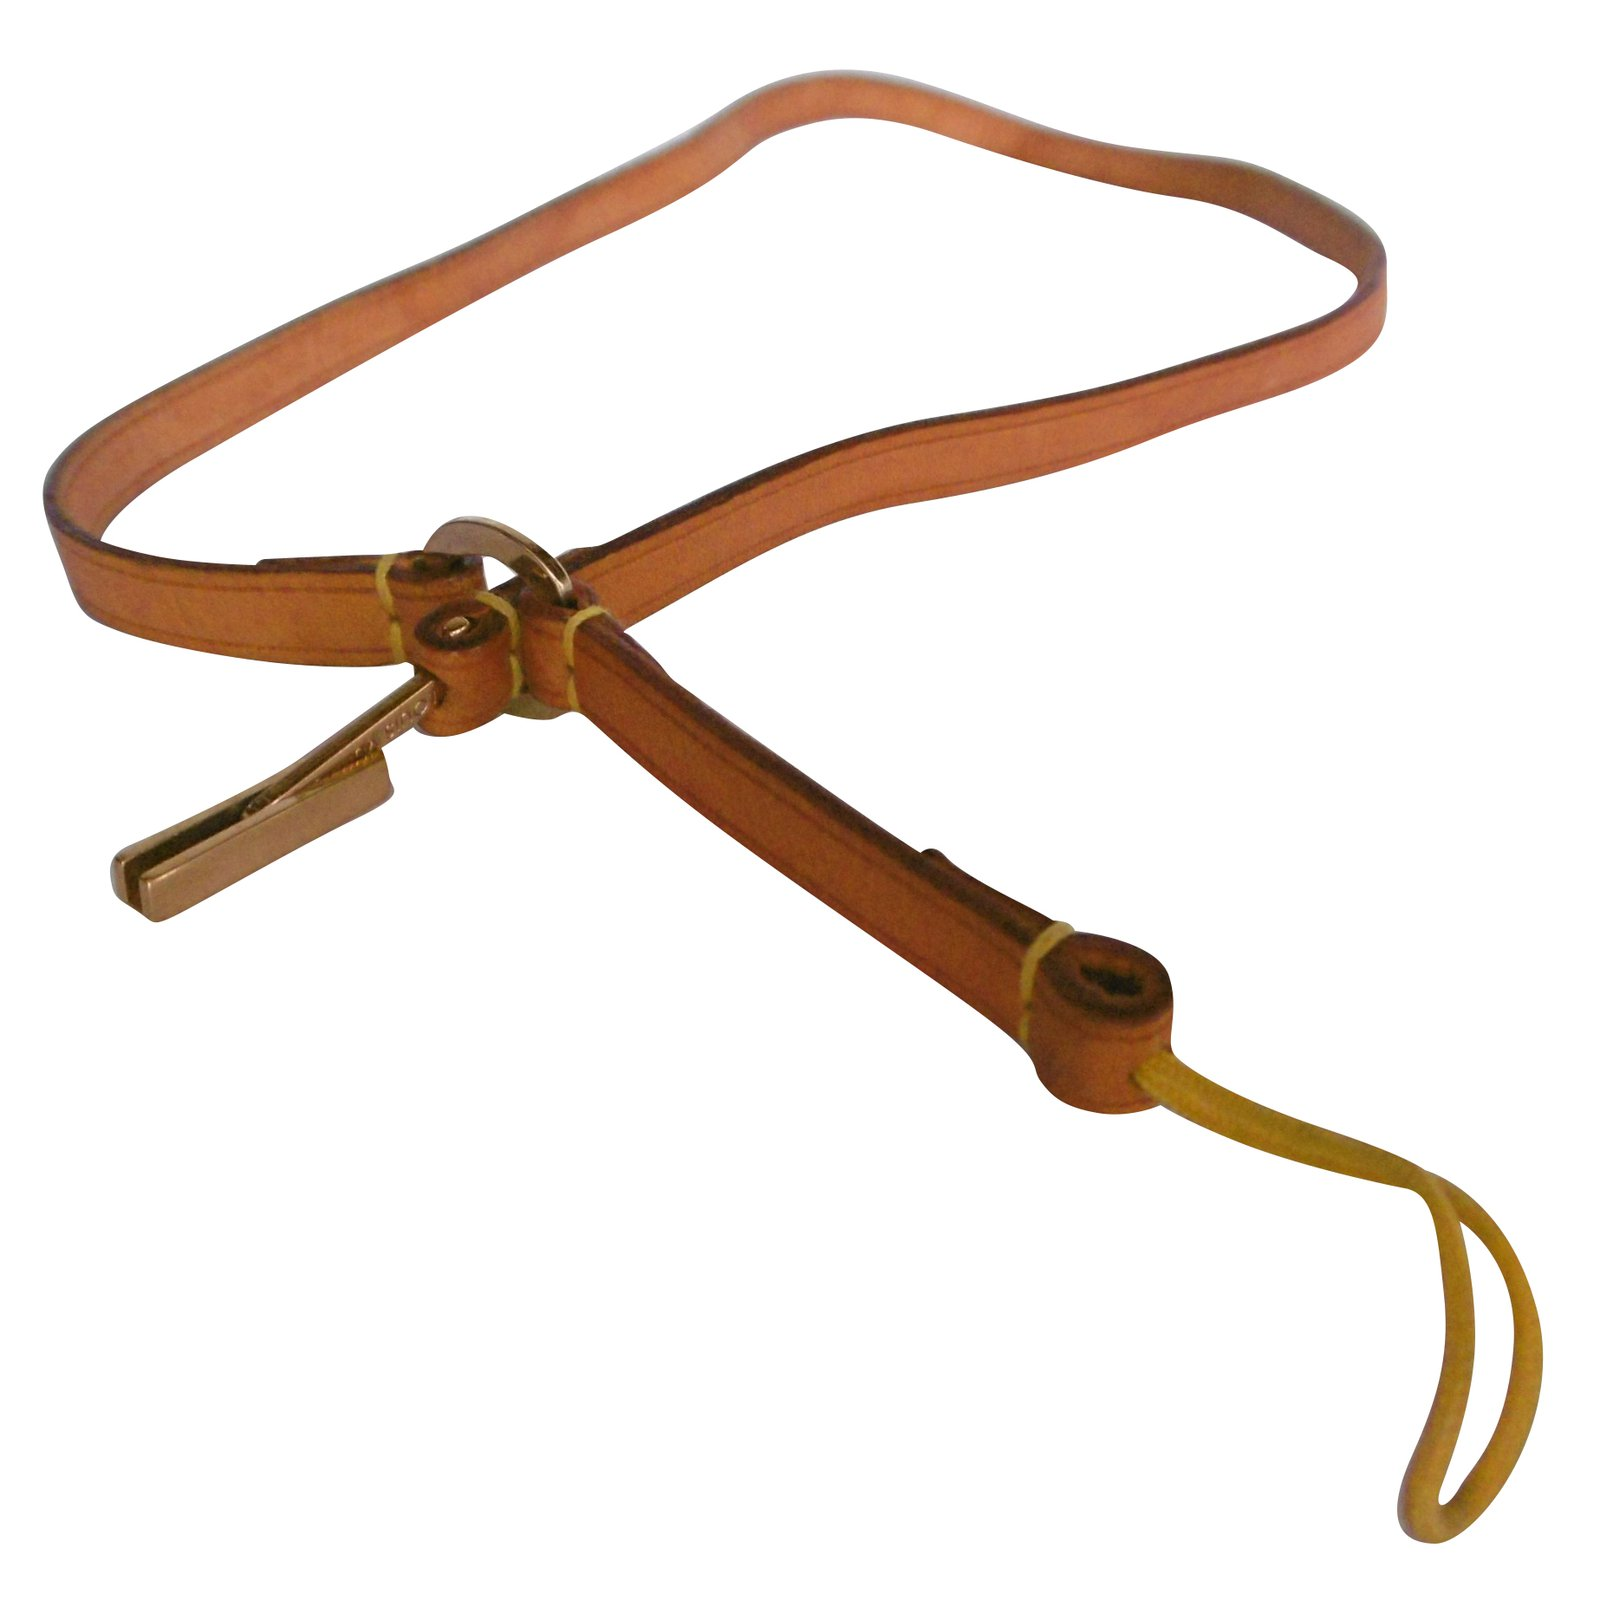 59c11d6e330b Louis Vuitton Leather Phone Accessory Strap Misc Leather Caramel ref.79019